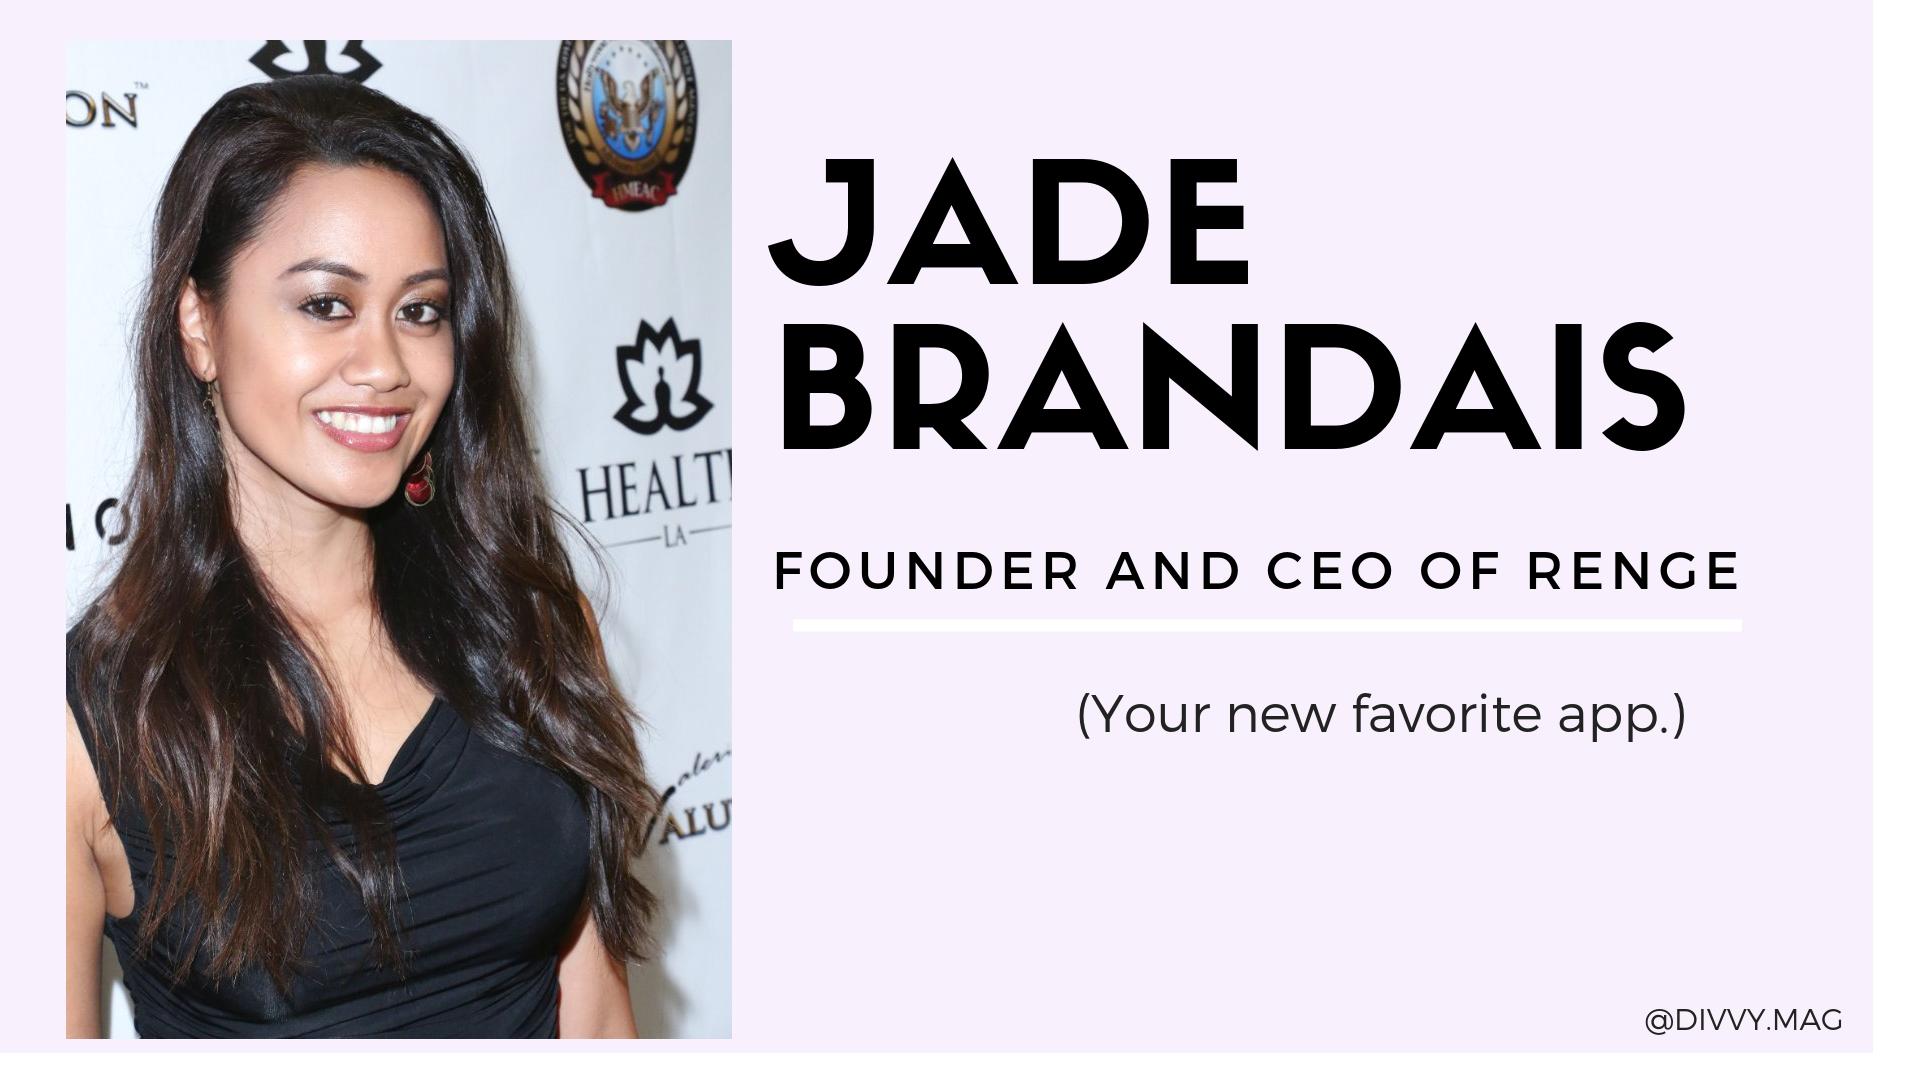 Jade Brandais founder and ceo of Renge